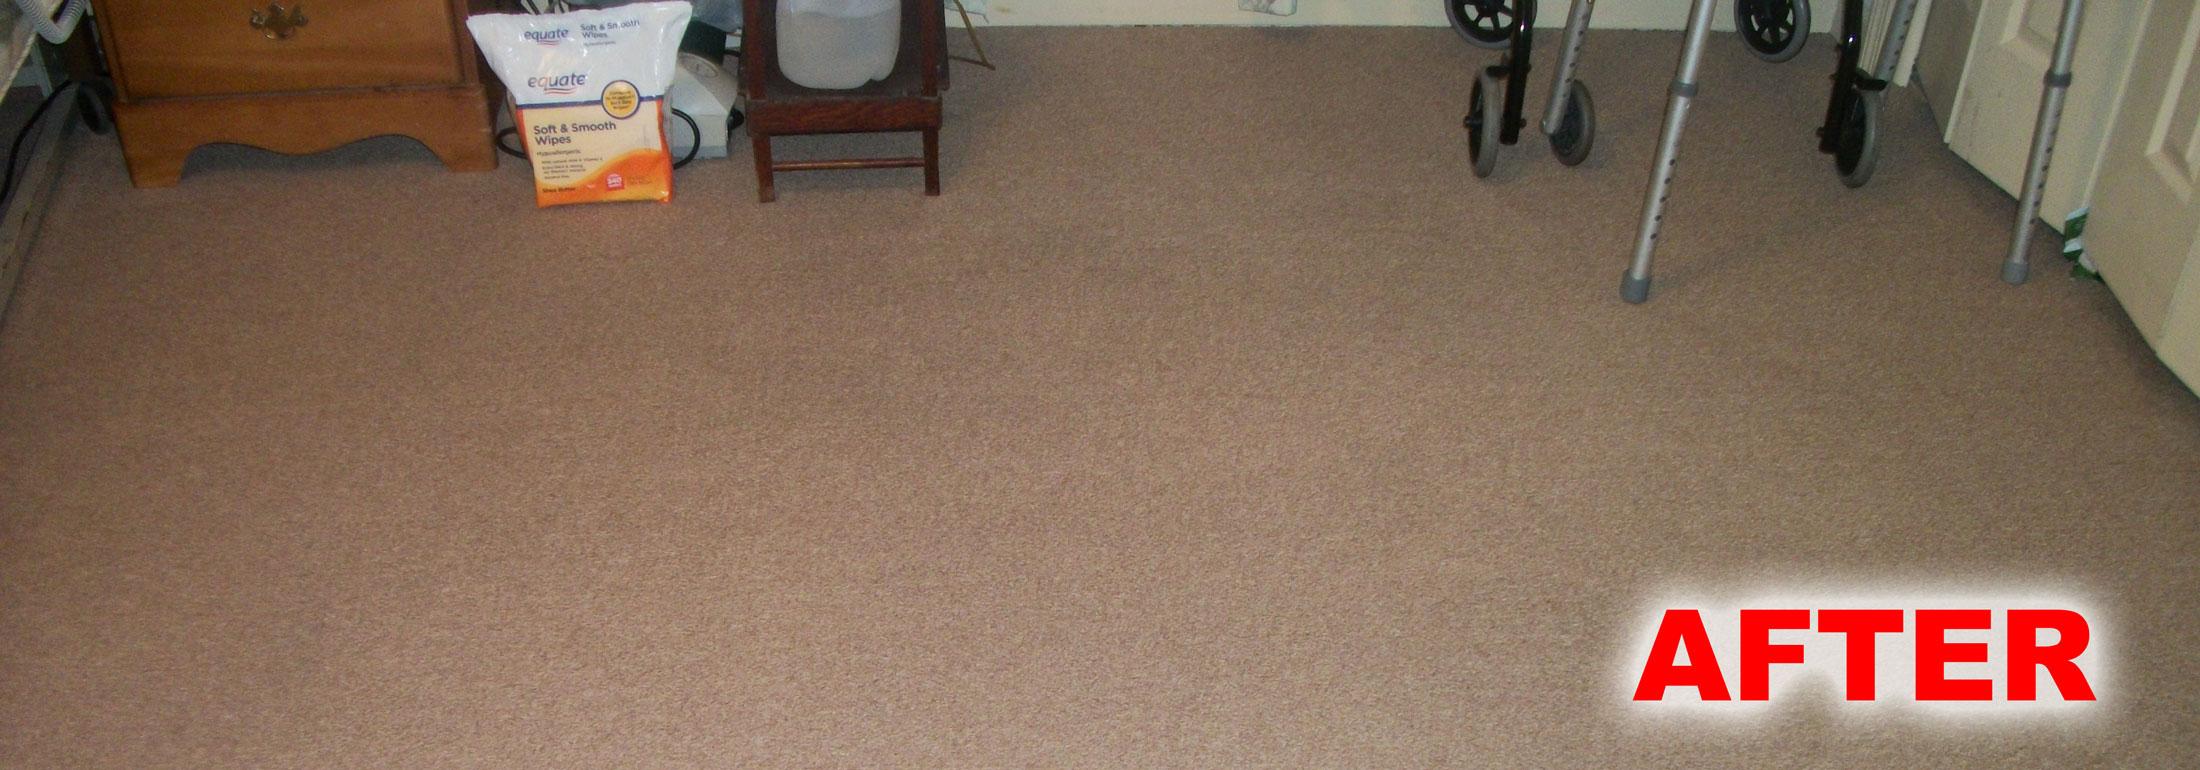 Floor Carpet Great Home Design